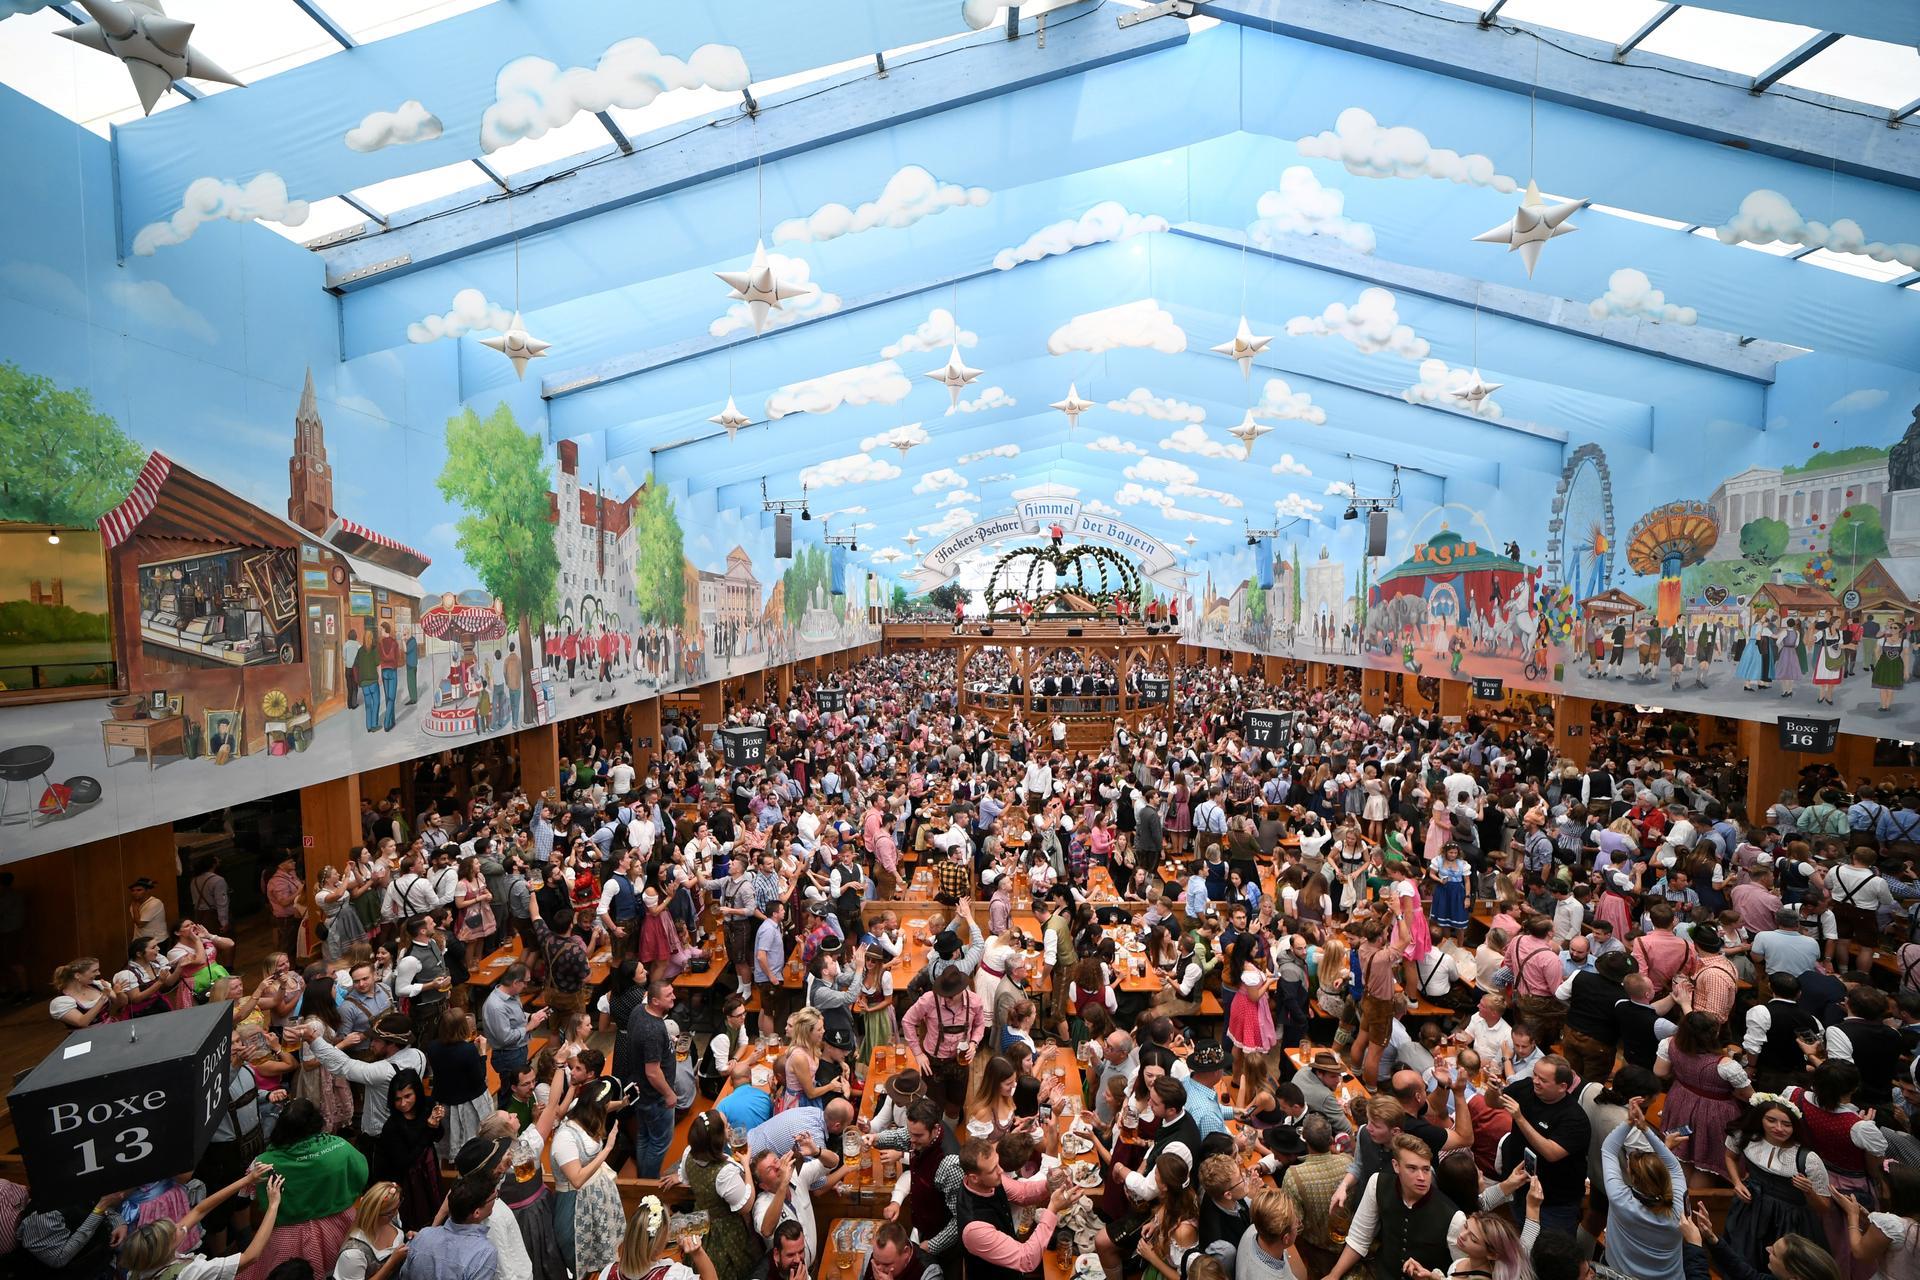 Germany cancels Oktoberfest beer festival due to coronavirus